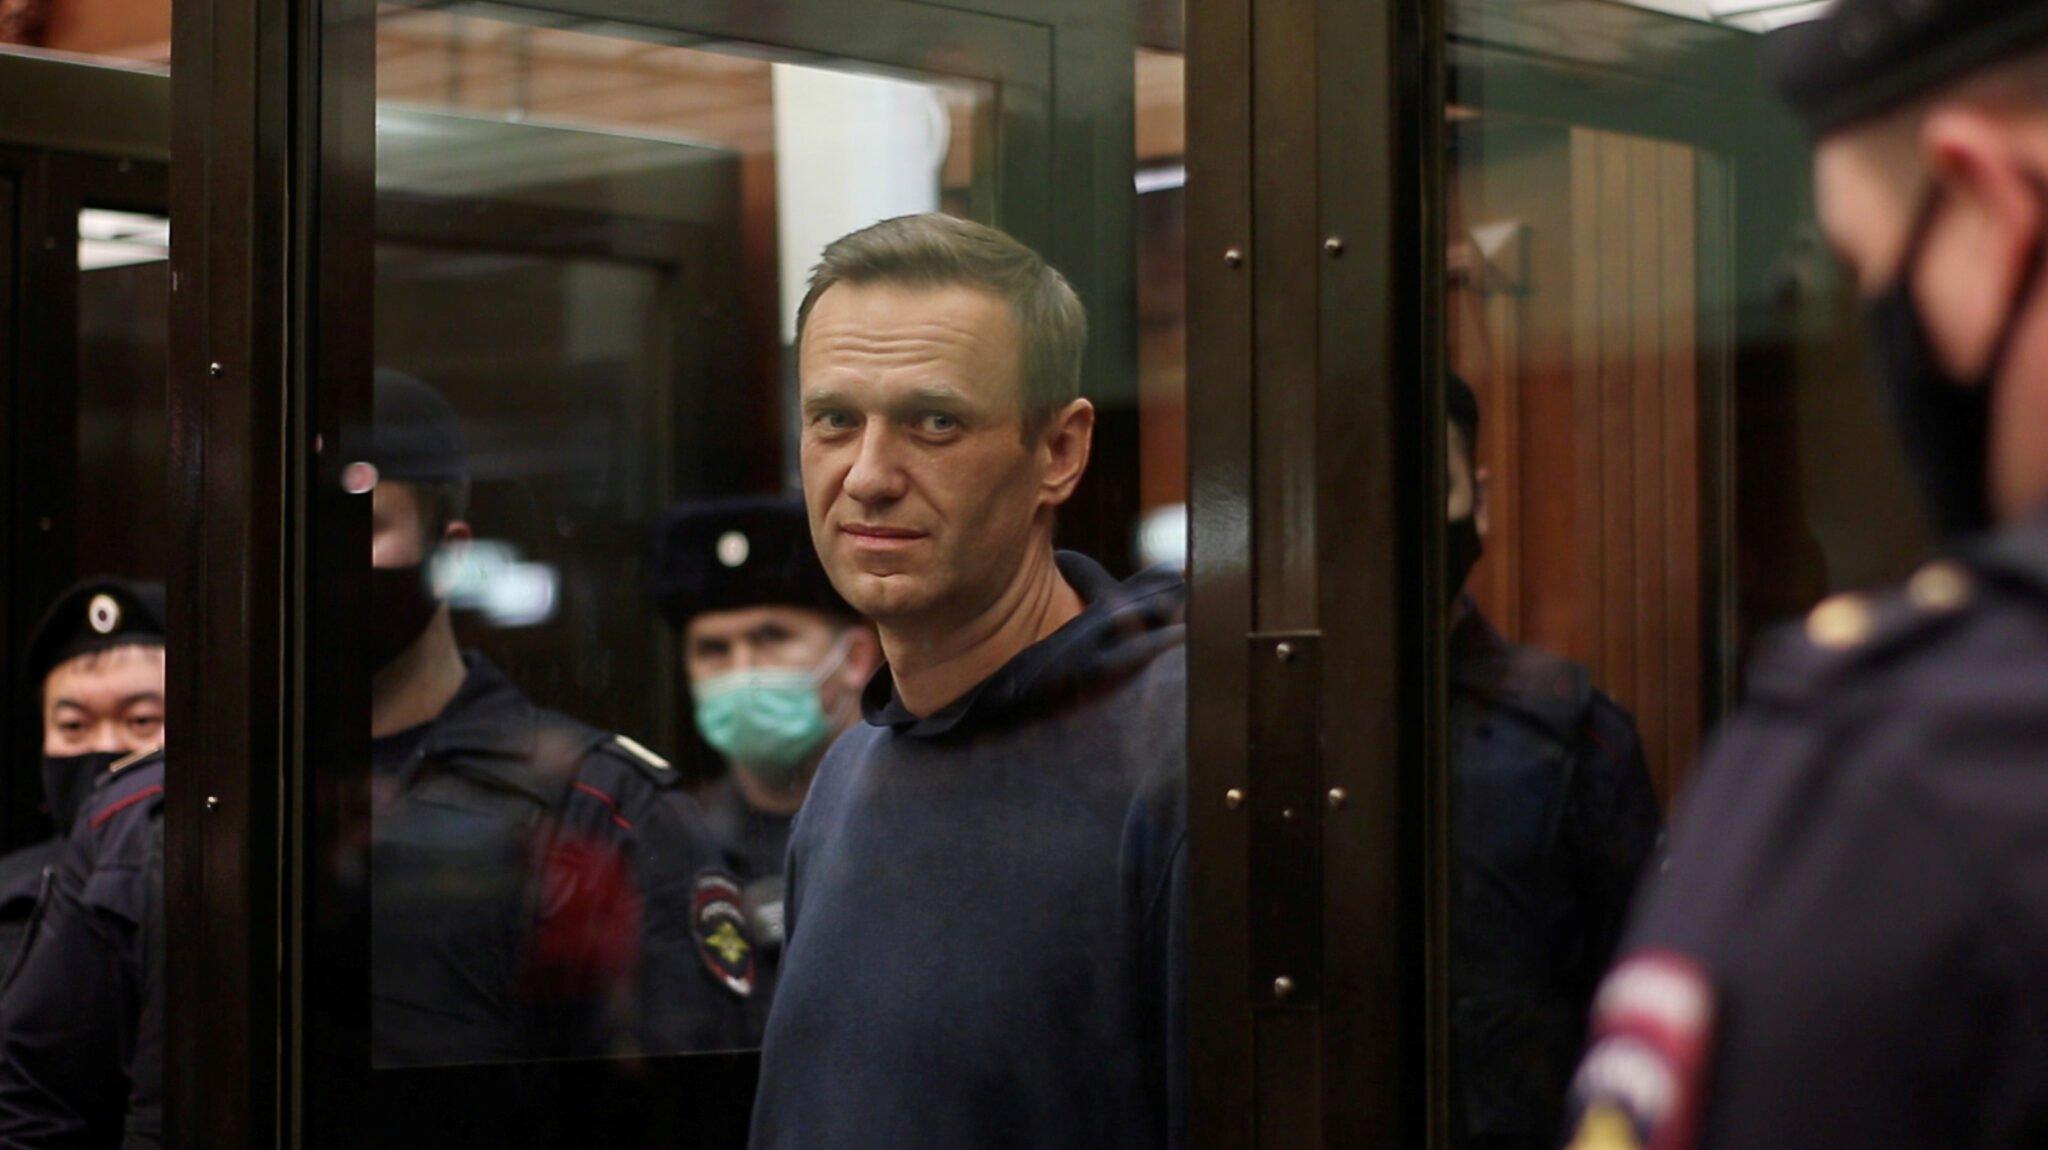 KUOW - In Court Hearing, Navalny Calls Putin A Naked